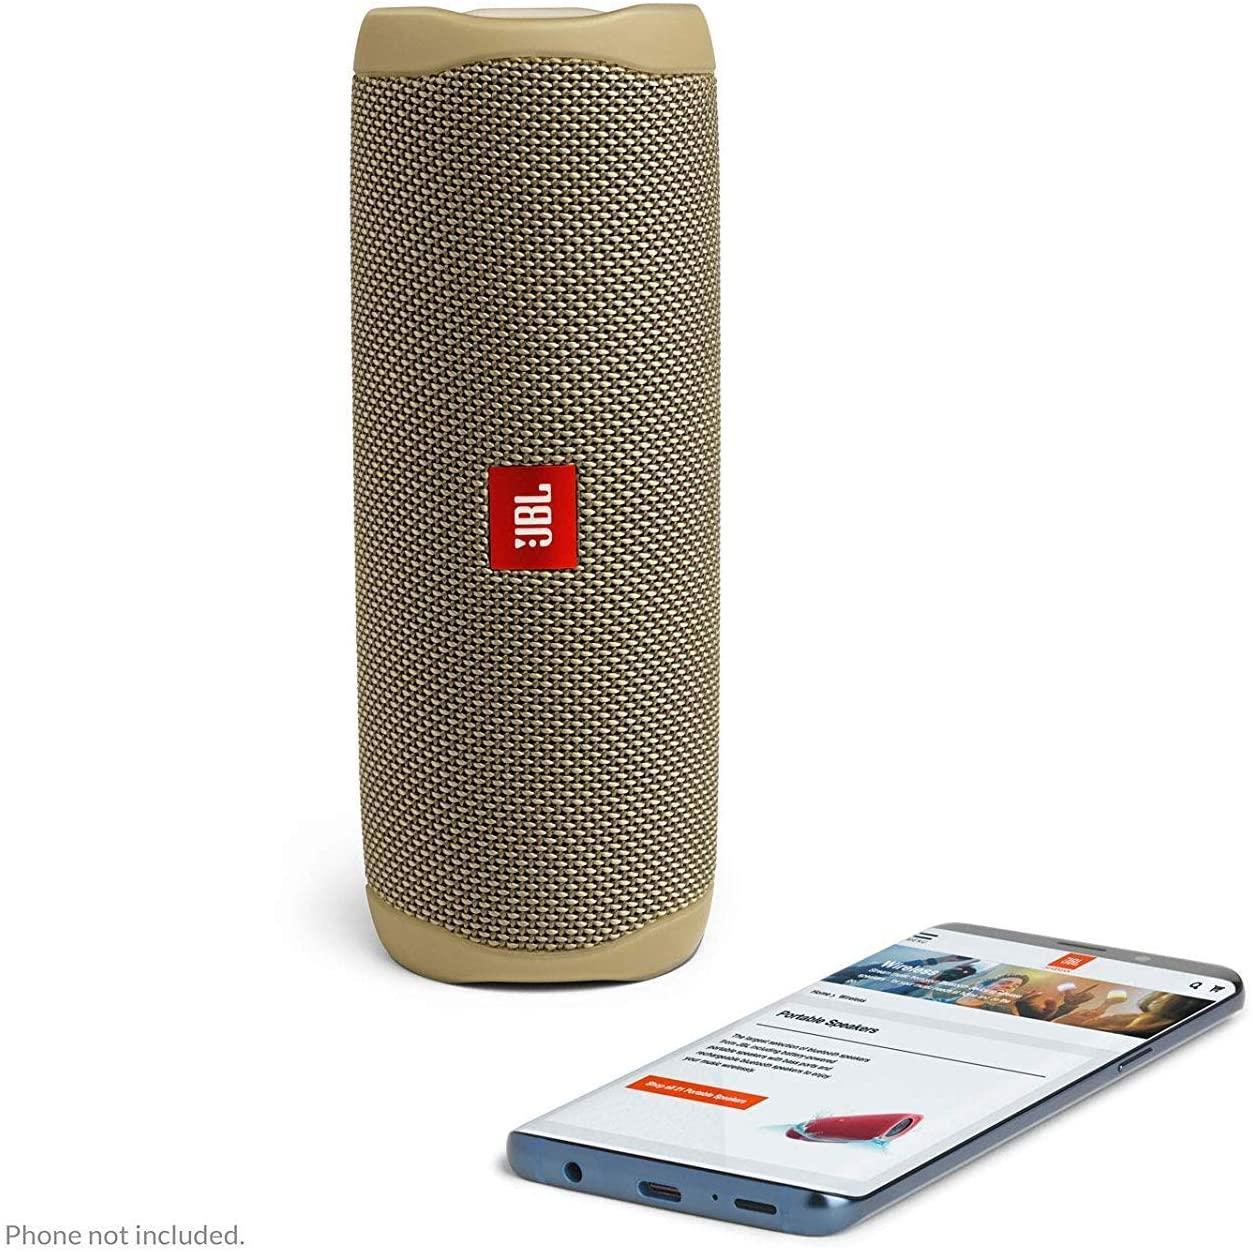 JBL-Flip-5-Portable-Waterproof-Bluetooth-PartyBoost-Speaker-Black-amp-Colours miniatura 34